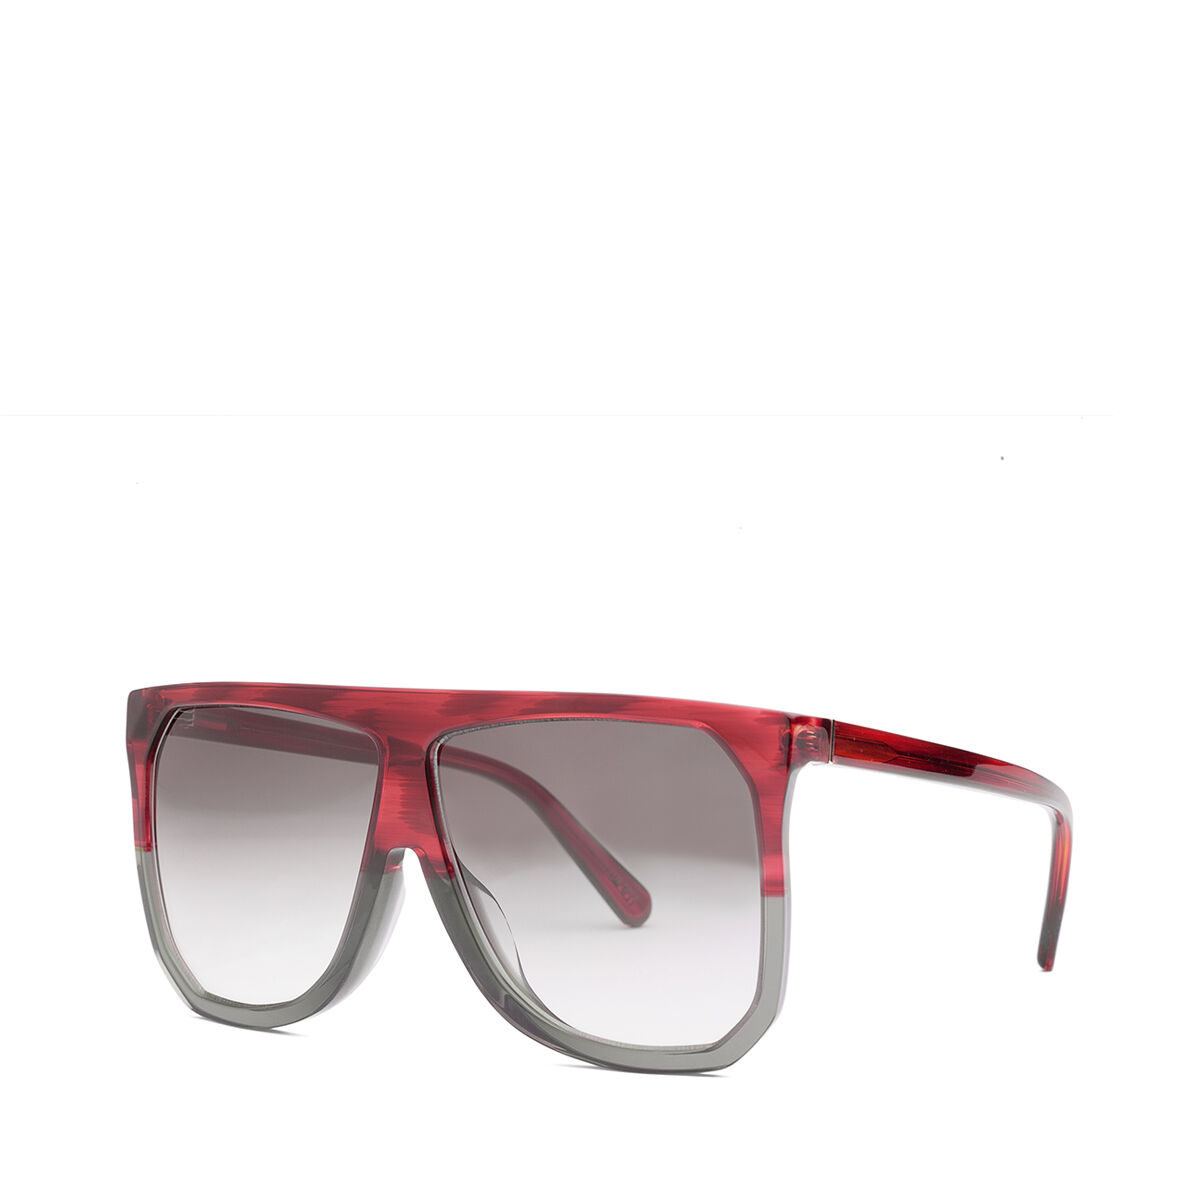 LOEWE Gafas Filipa Burdeos/Gris/Gris Degradado all